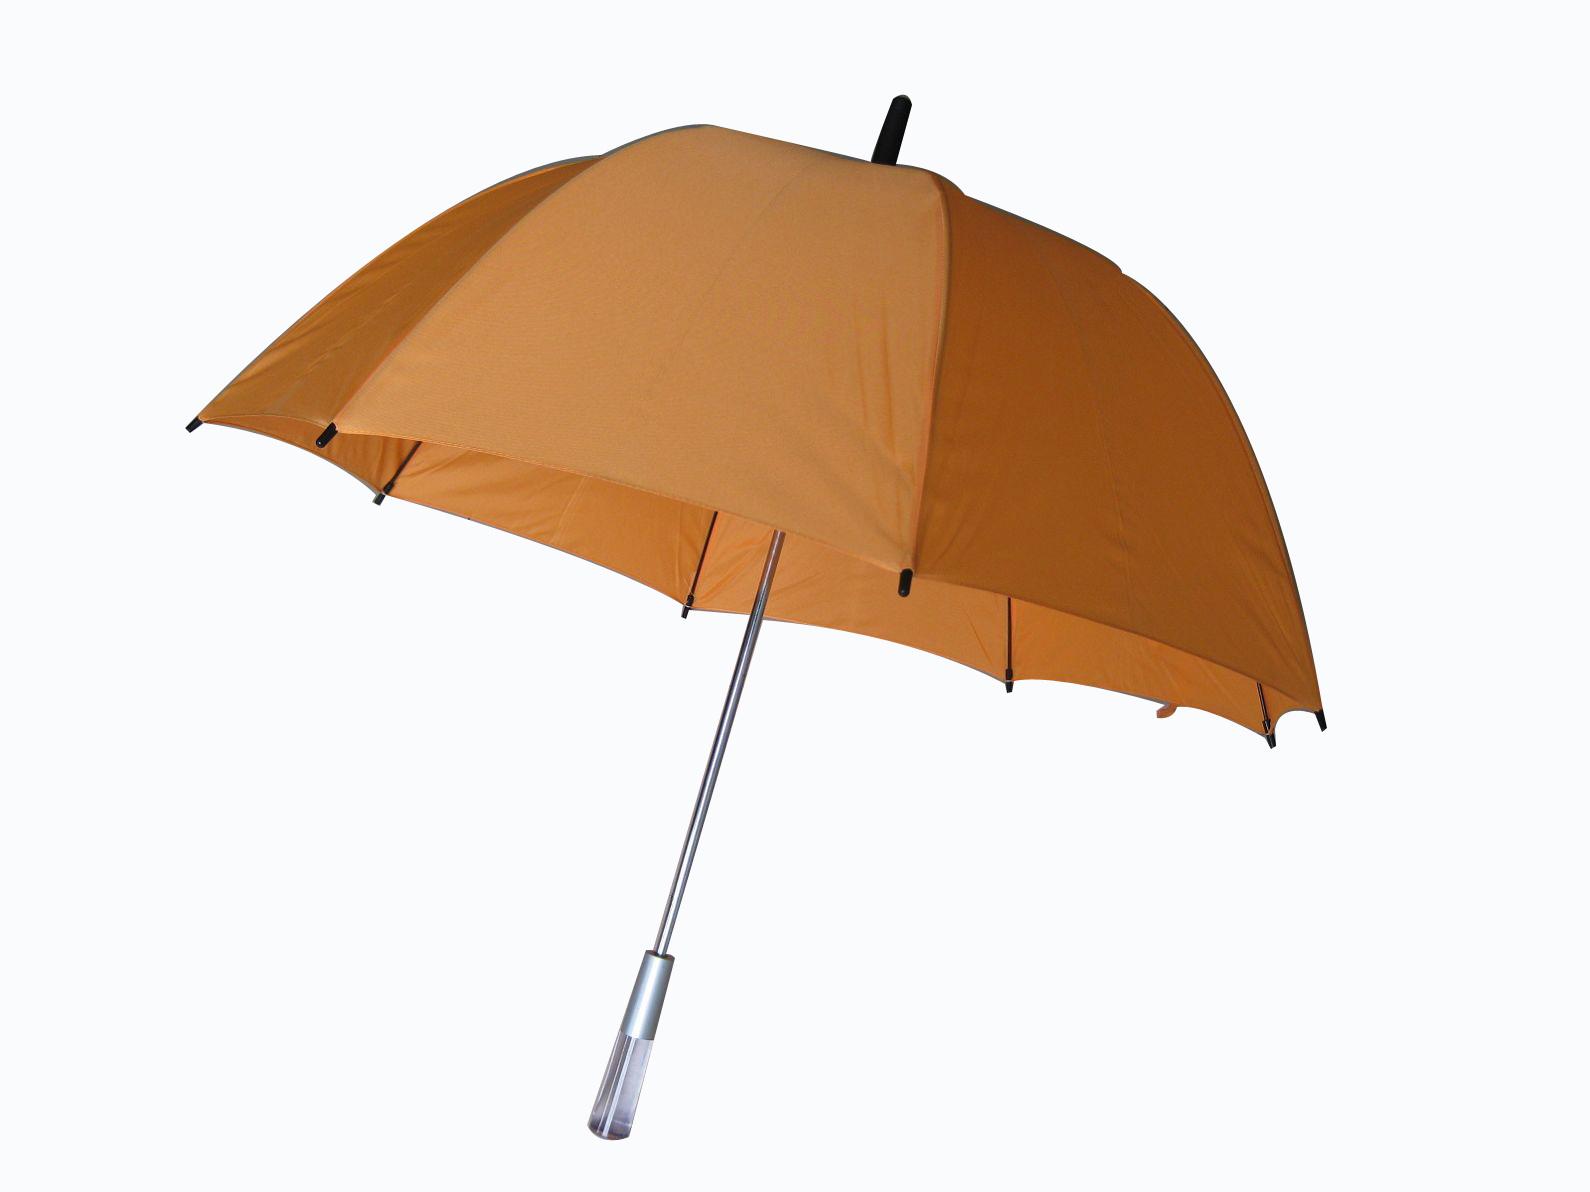 Safety Manual Open Appollo Umbrella (SU021)